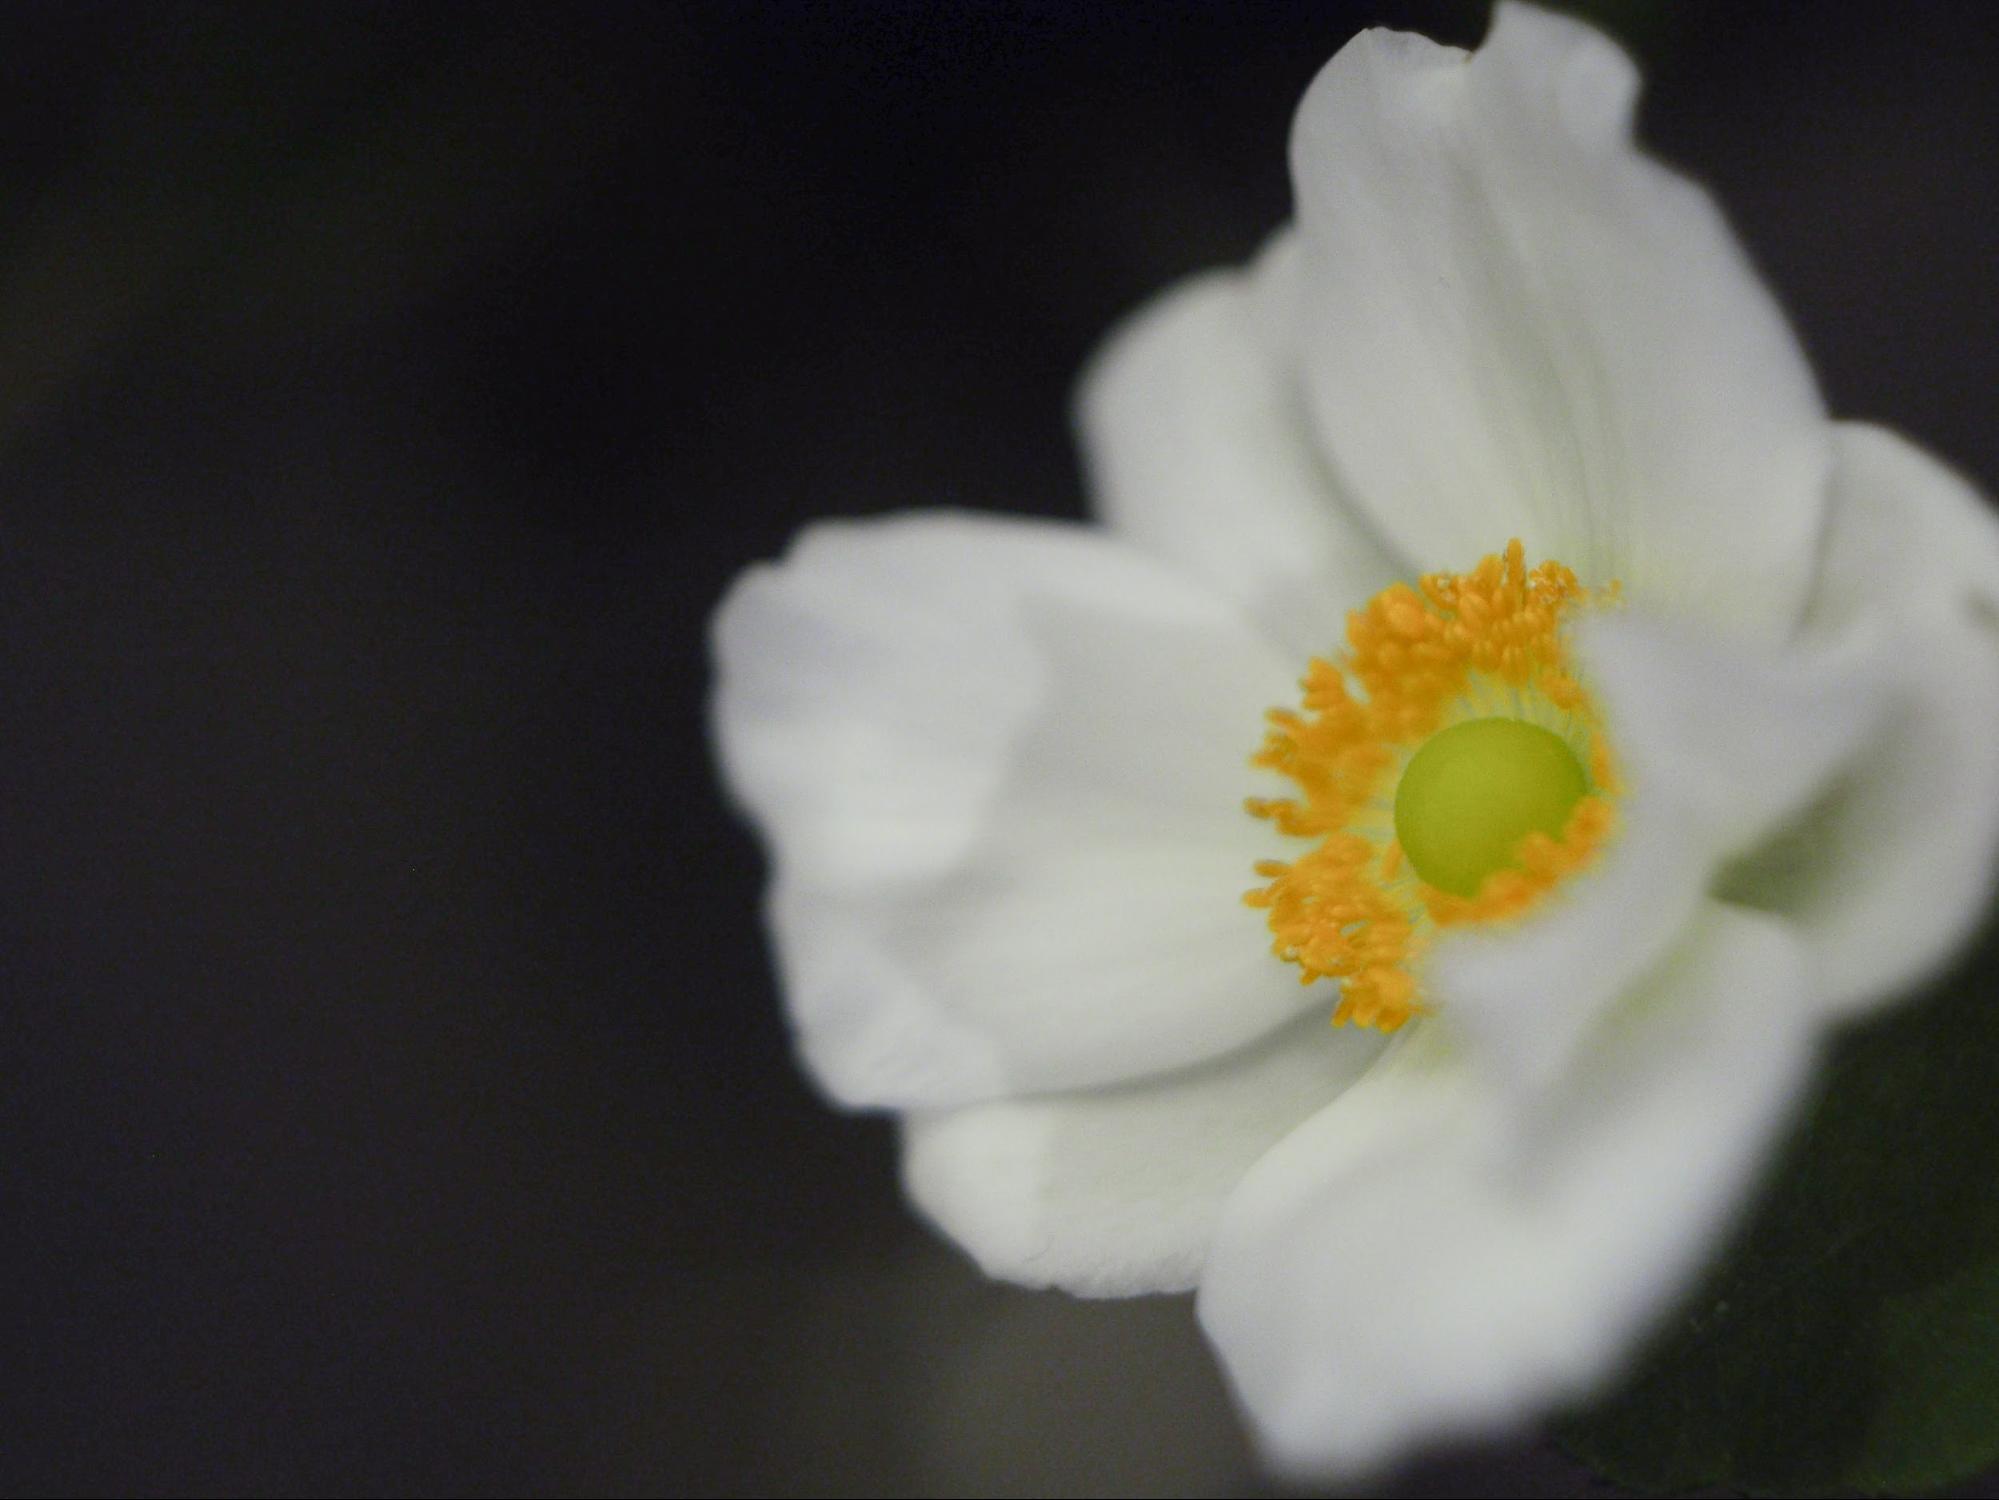 mimi・9月の切り花〜秋明菊【花と暮らす】